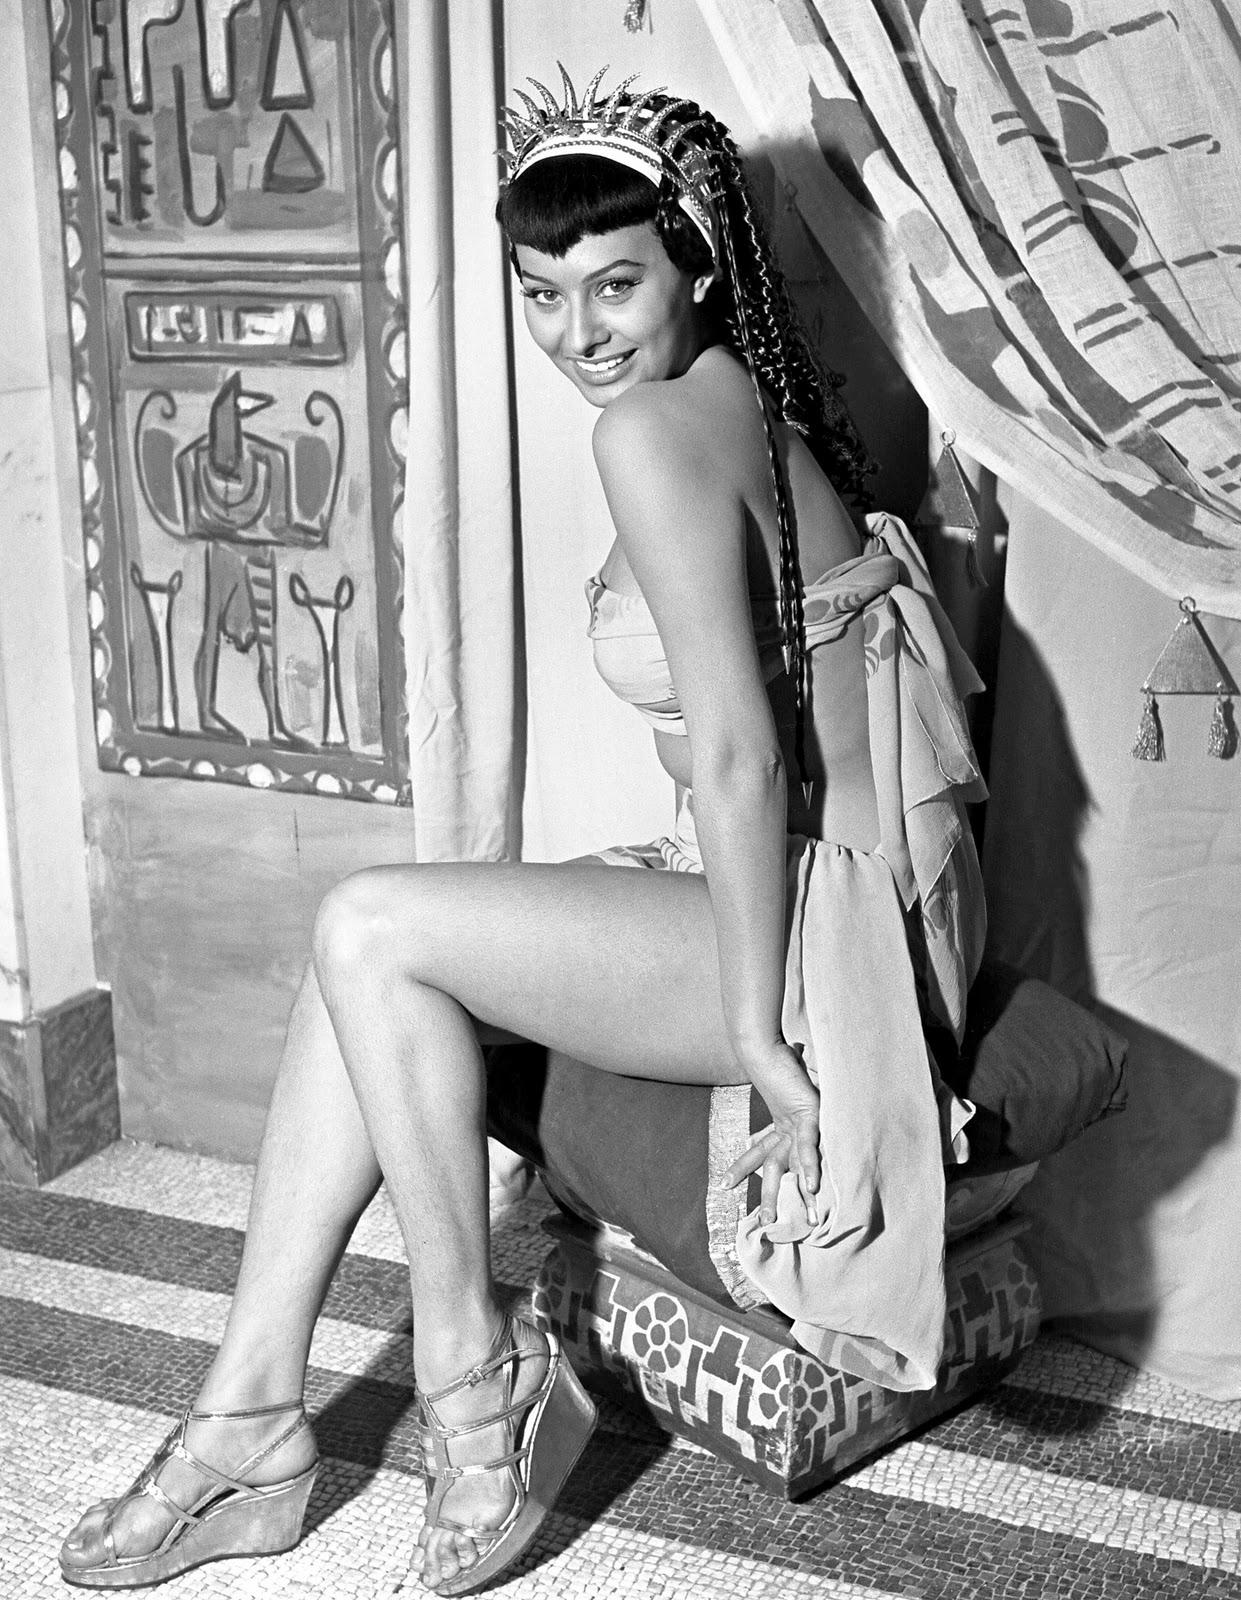 http://2.bp.blogspot.com/-aloG3Mx_DTY/TworBST4mWI/AAAAAAAACJM/Lwk9x2wacqw/s1600/Loren-Sophia-Two-Nights-With-Cleopatra_01.jpg